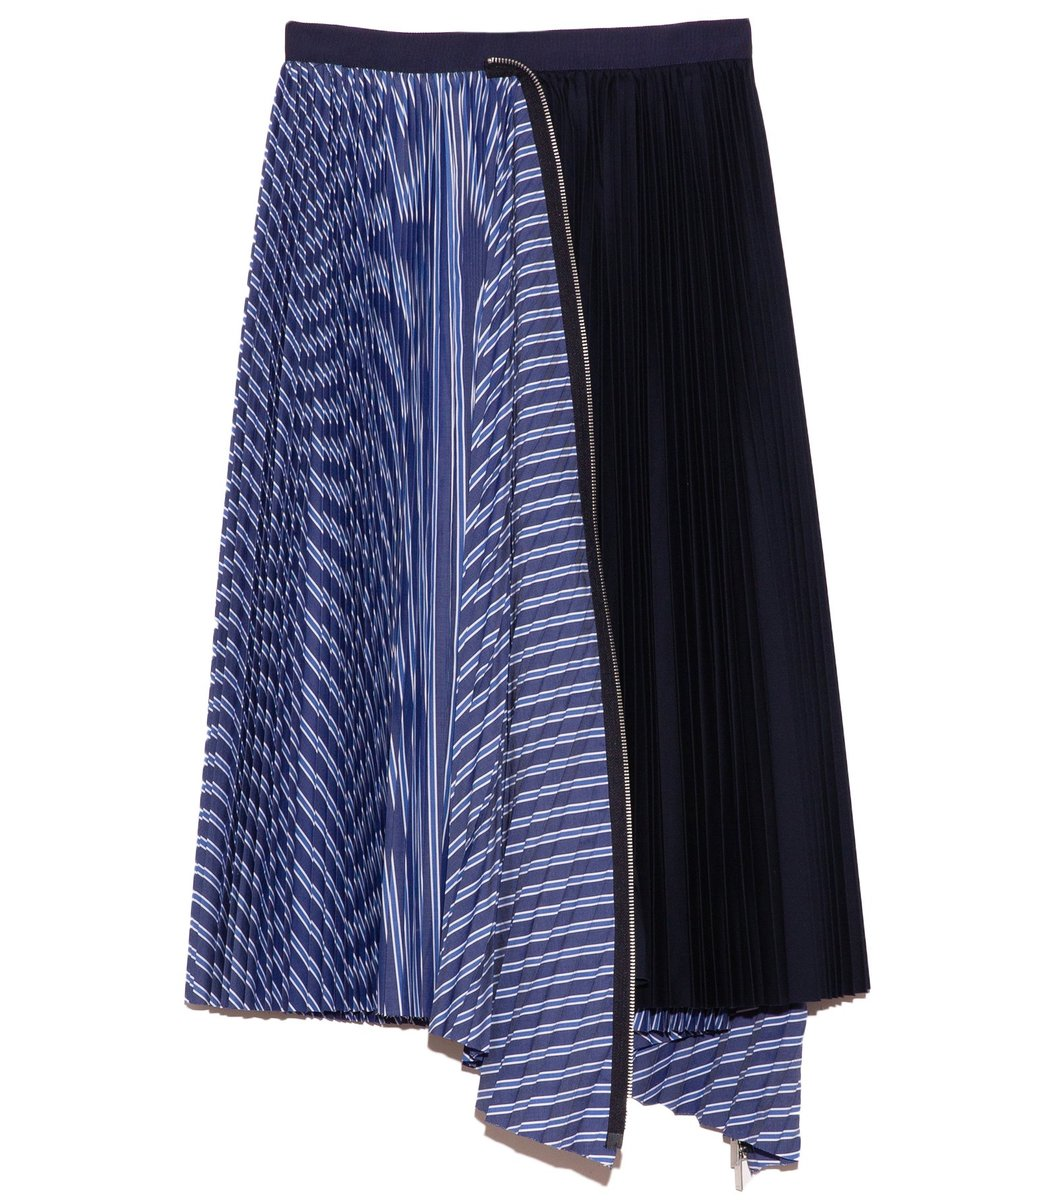 SACAI Cotton Poplin Zipper Skirt in Random Stripe